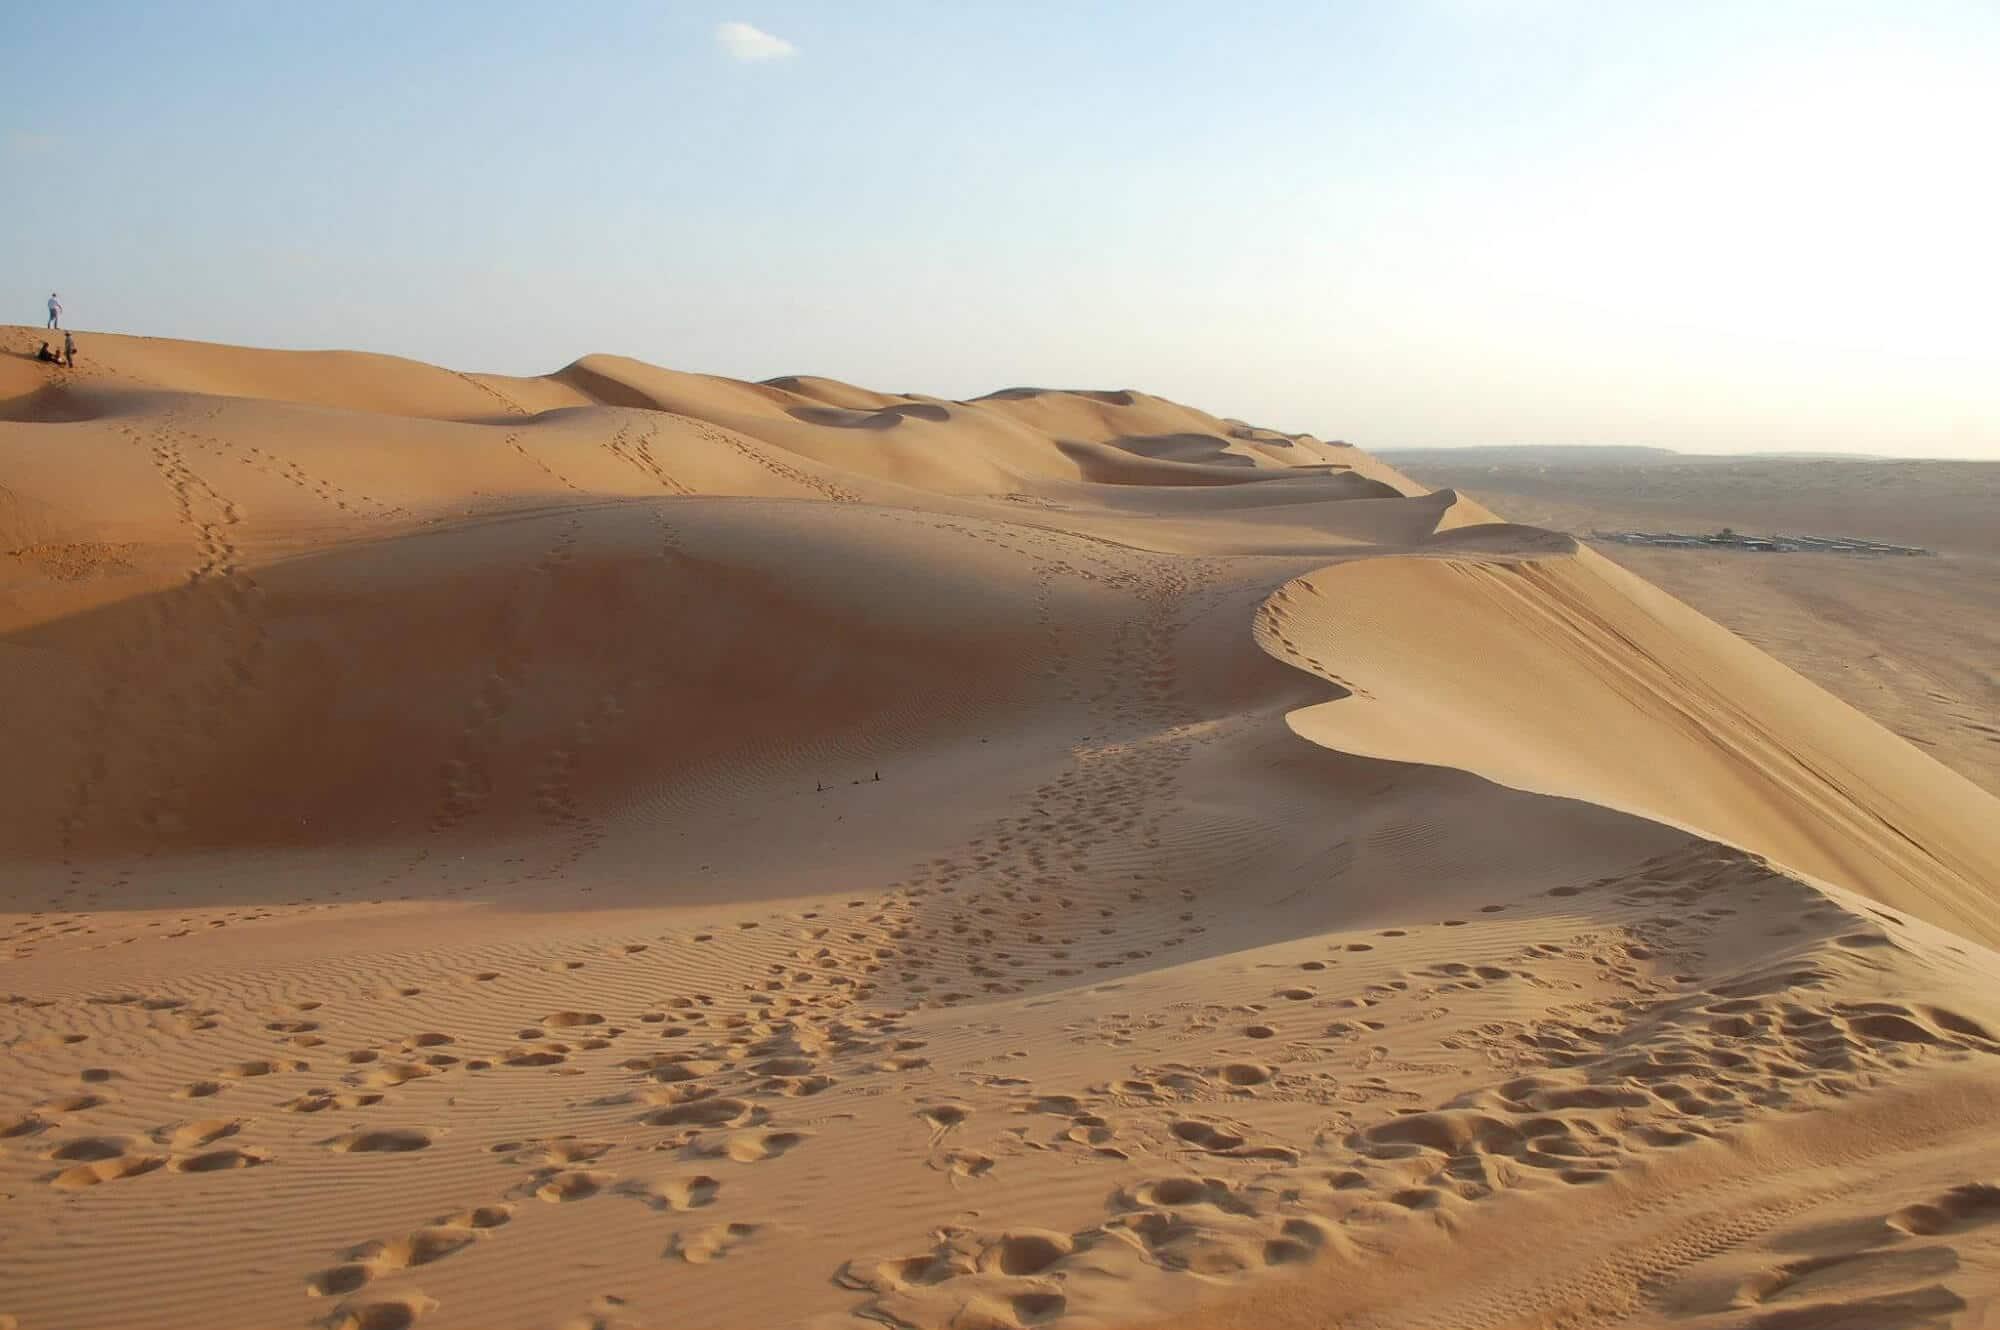 Travelling through Omani desert